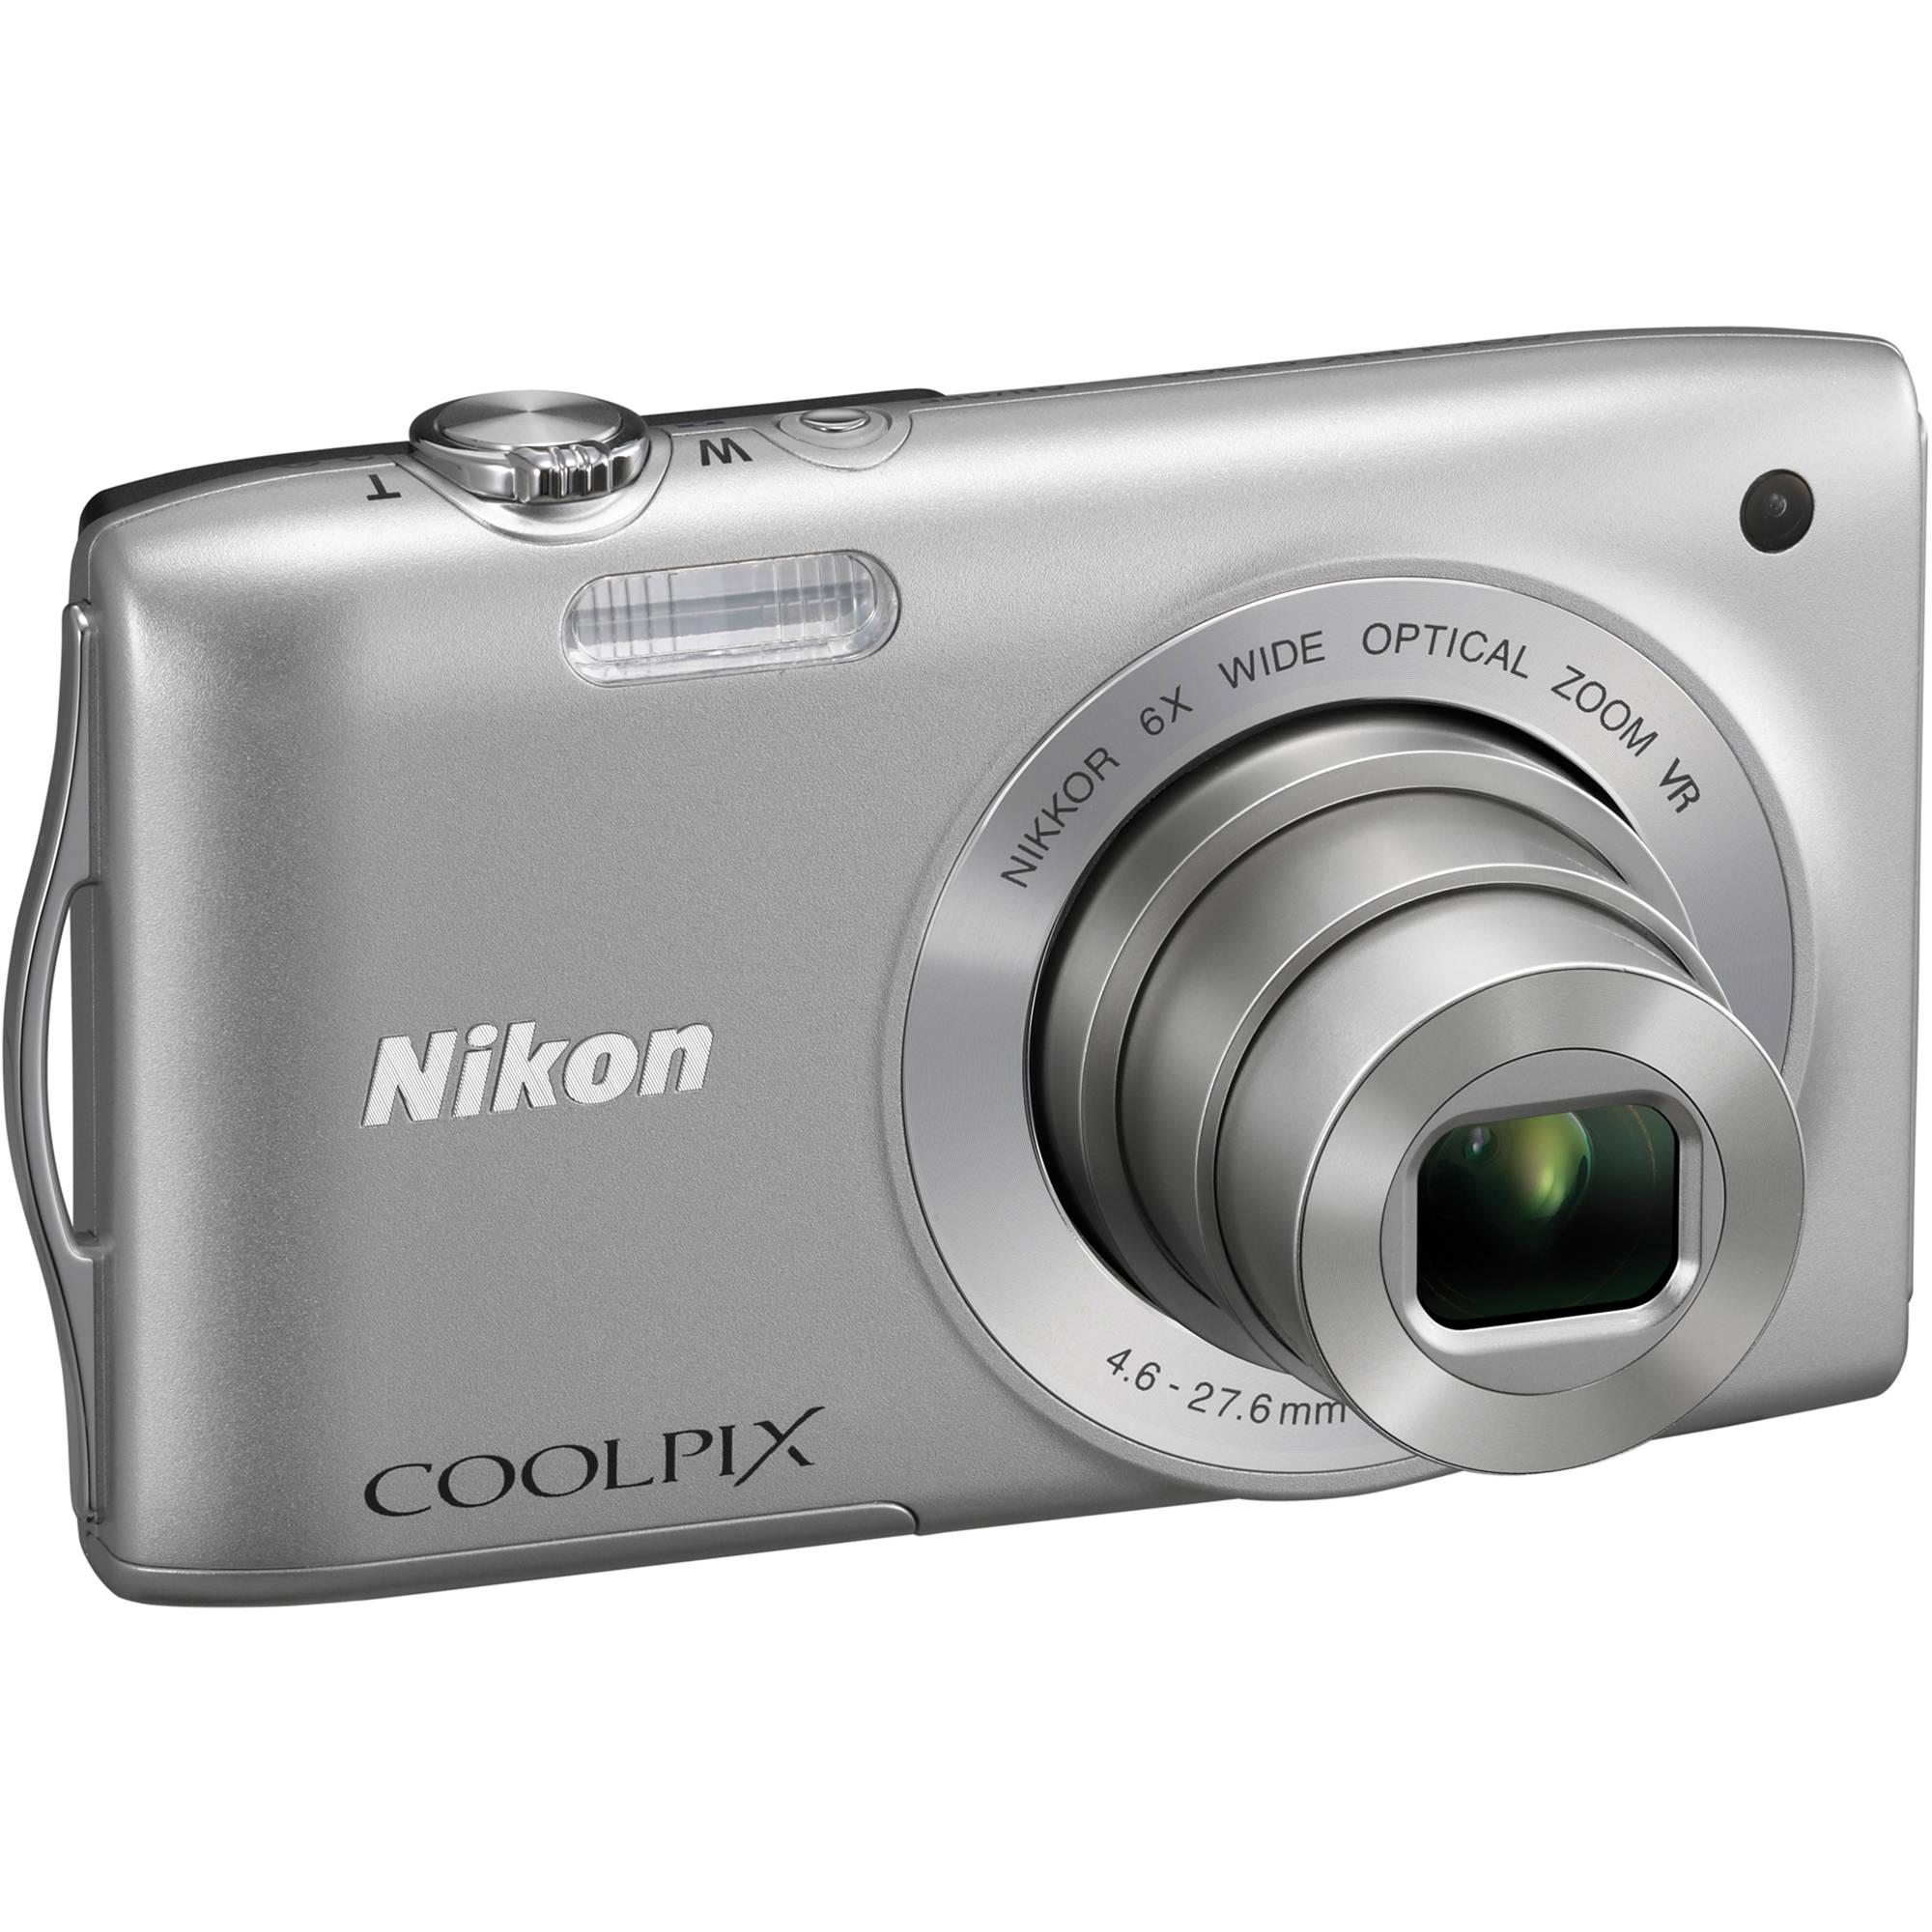 nikon coolpix s3300 digital camera silver 26309 b h photo rh bhphotovideo com nikon coolpix s3000 user manual Nikon Coolpix User Manual